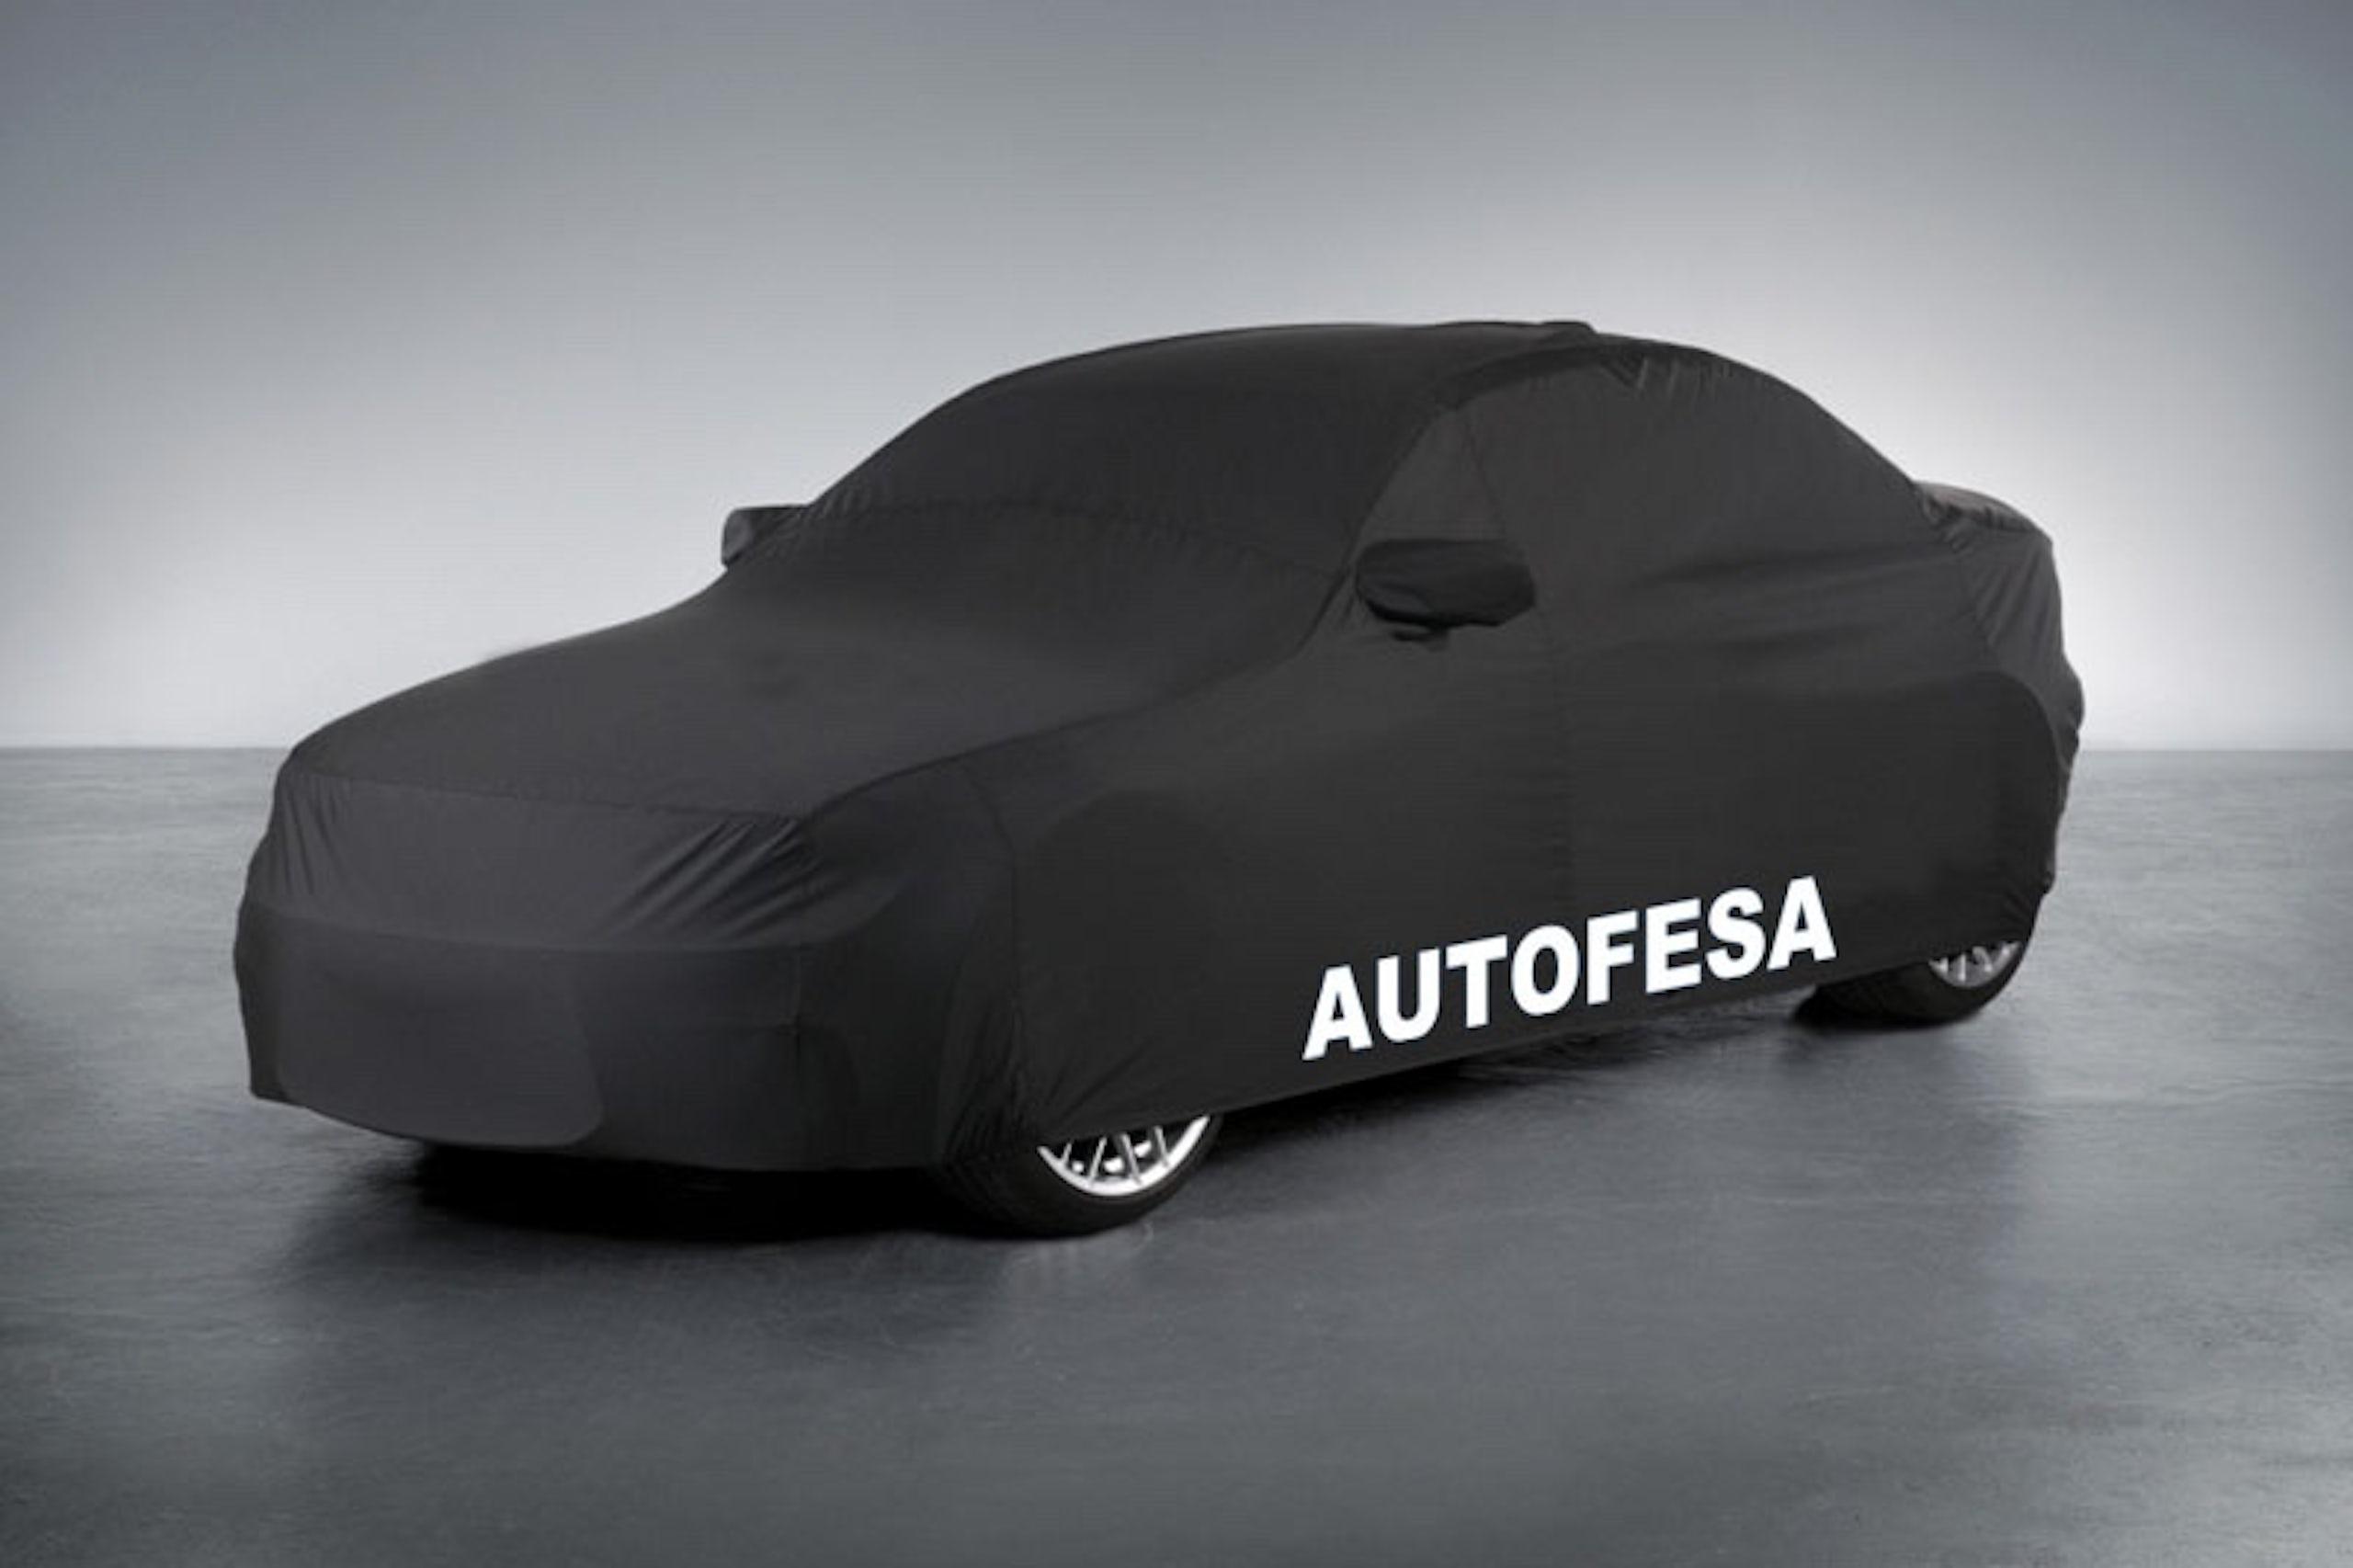 Ford Mondeo 2.0 TDCi 150cv Trend 5p Powershift Auto S/S - Foto 30